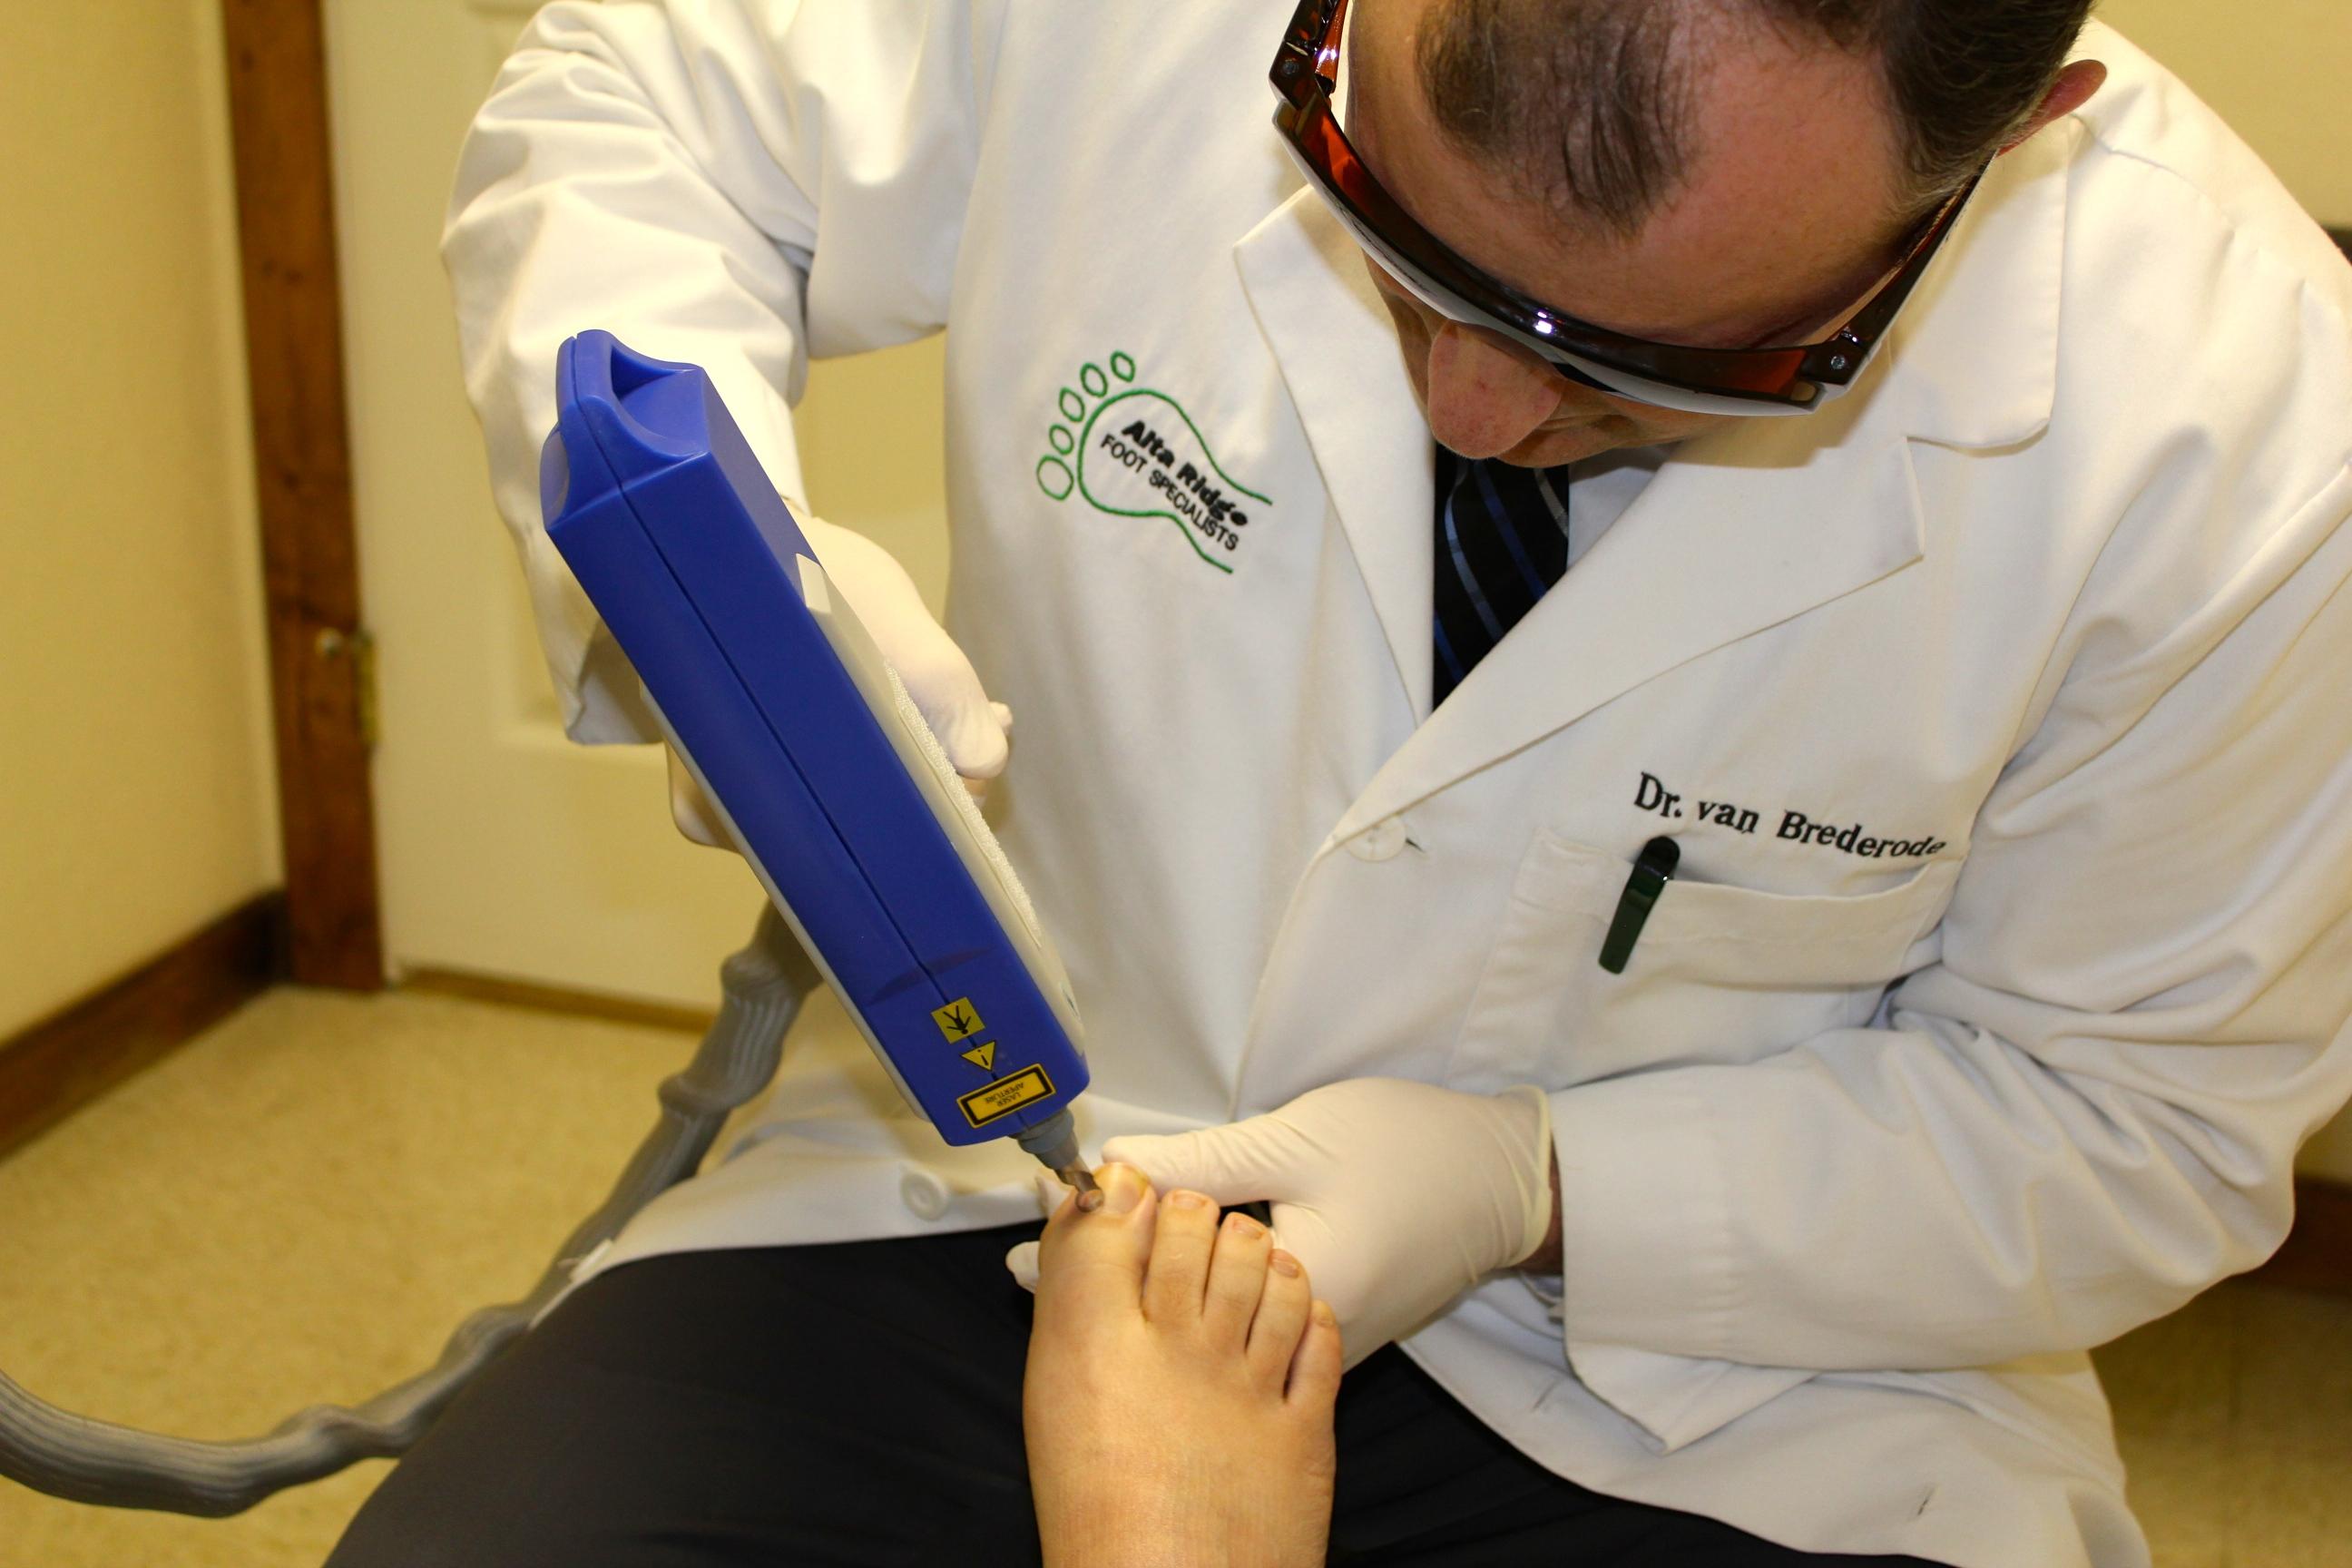 dr van brederode performing laser treatment